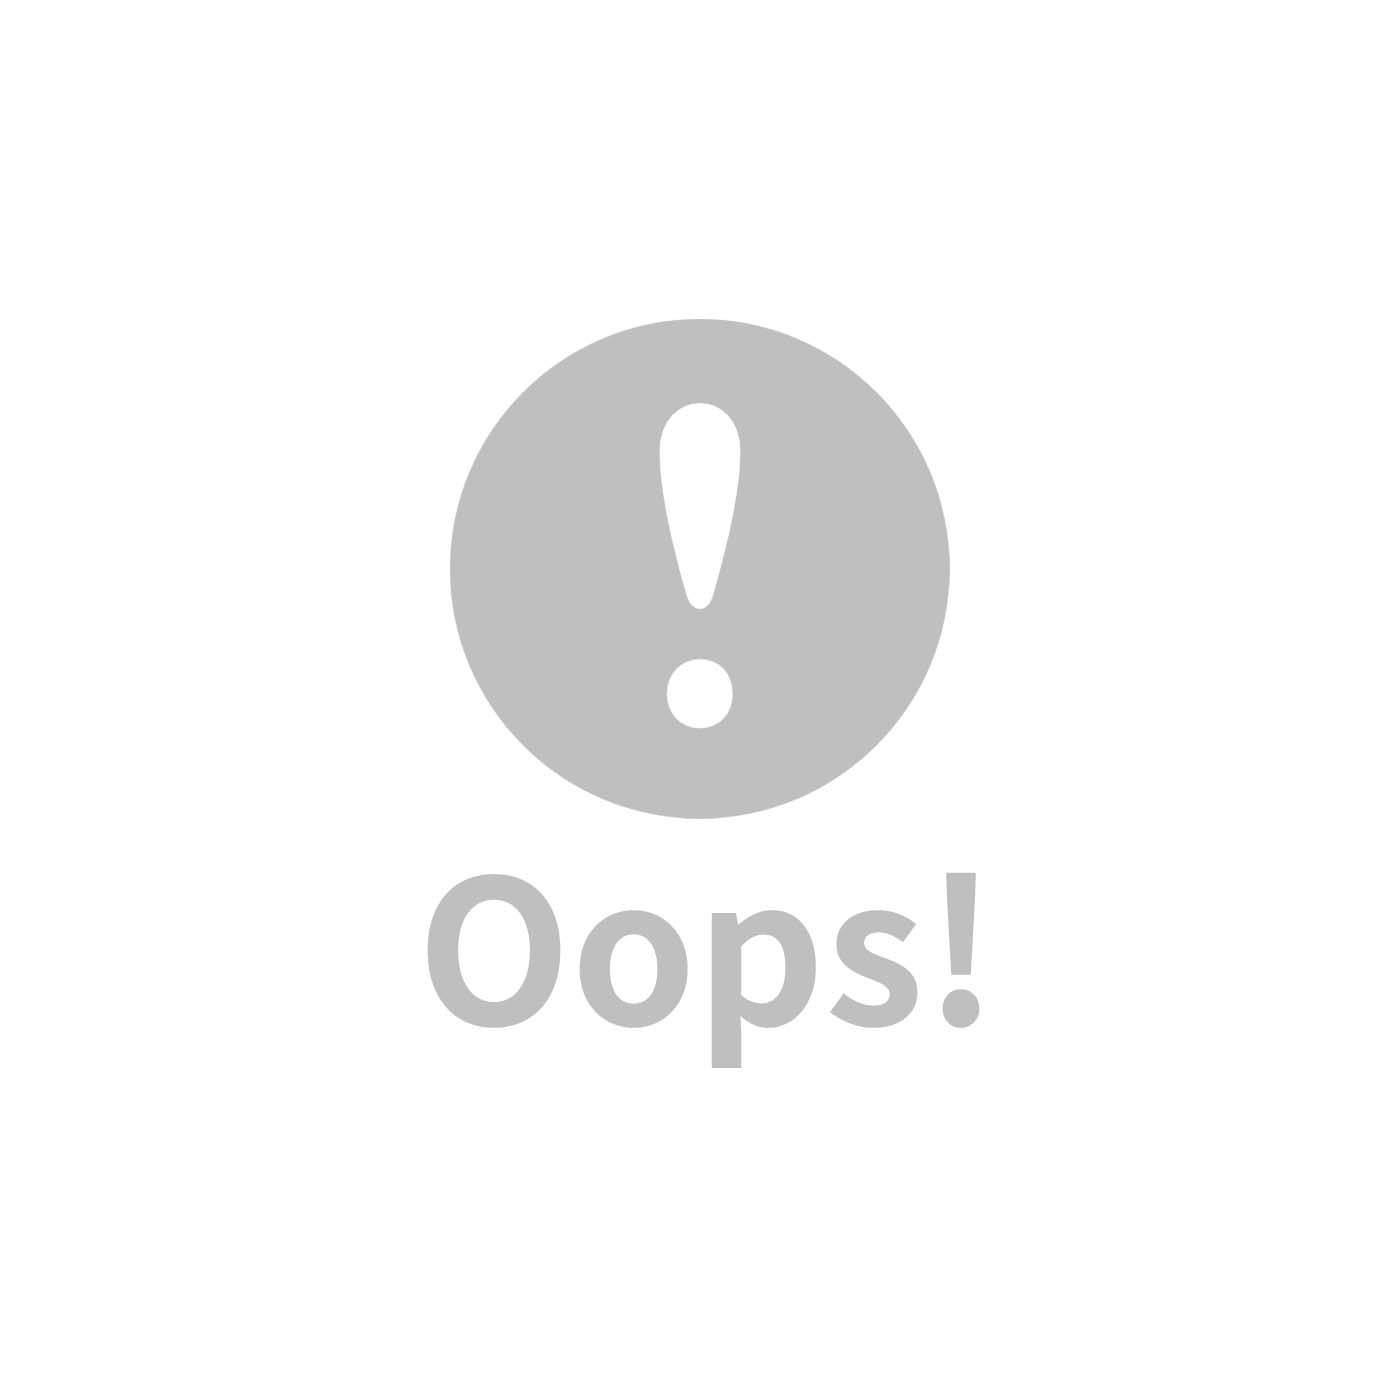 global affairs 童話手工編織乖乖兔音樂鈴-糖果黃